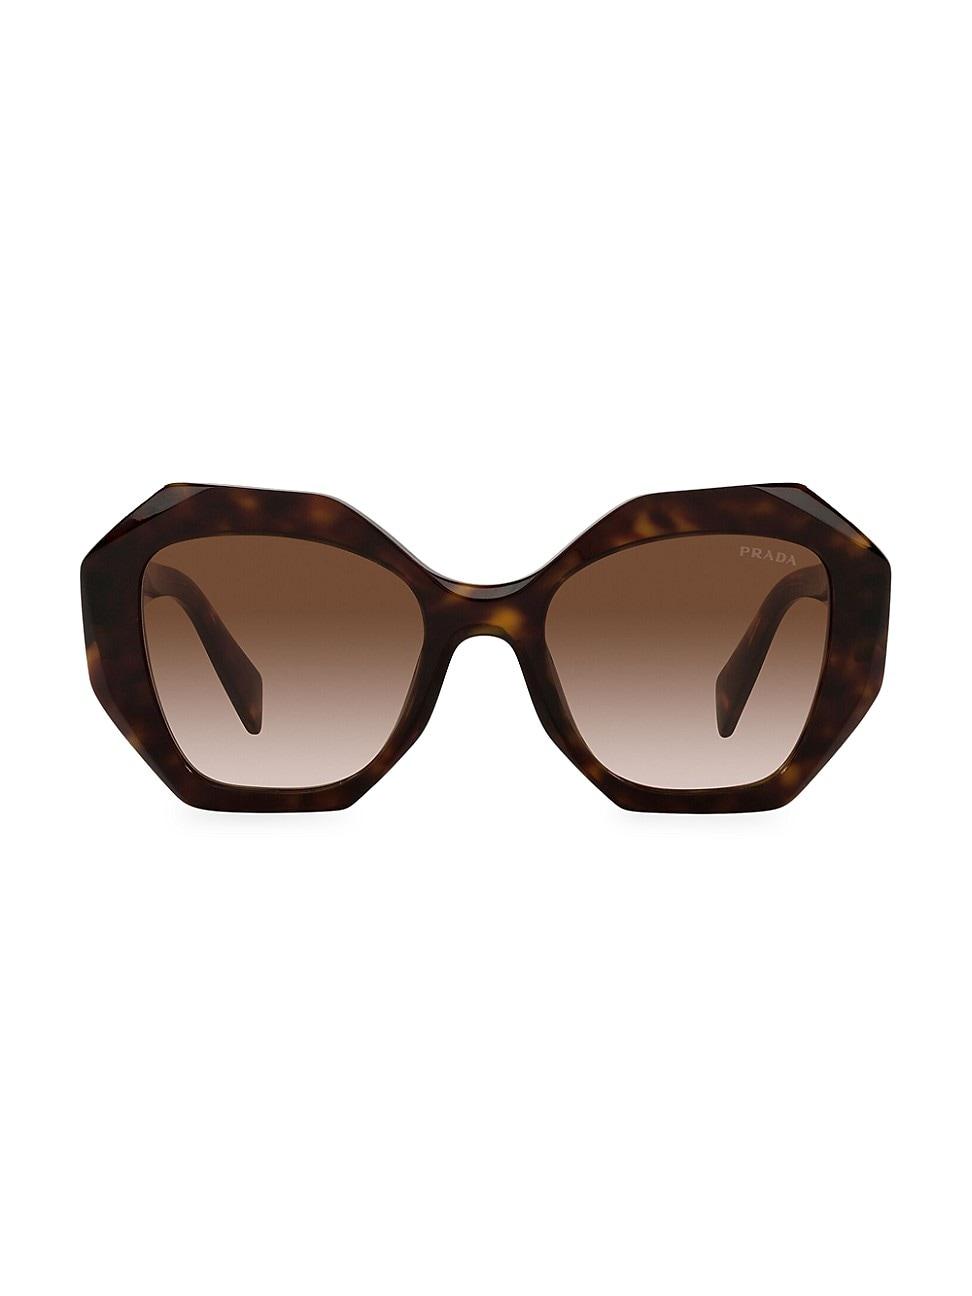 Prada Women's 53mm Geometric Sunglasses In Tortoise